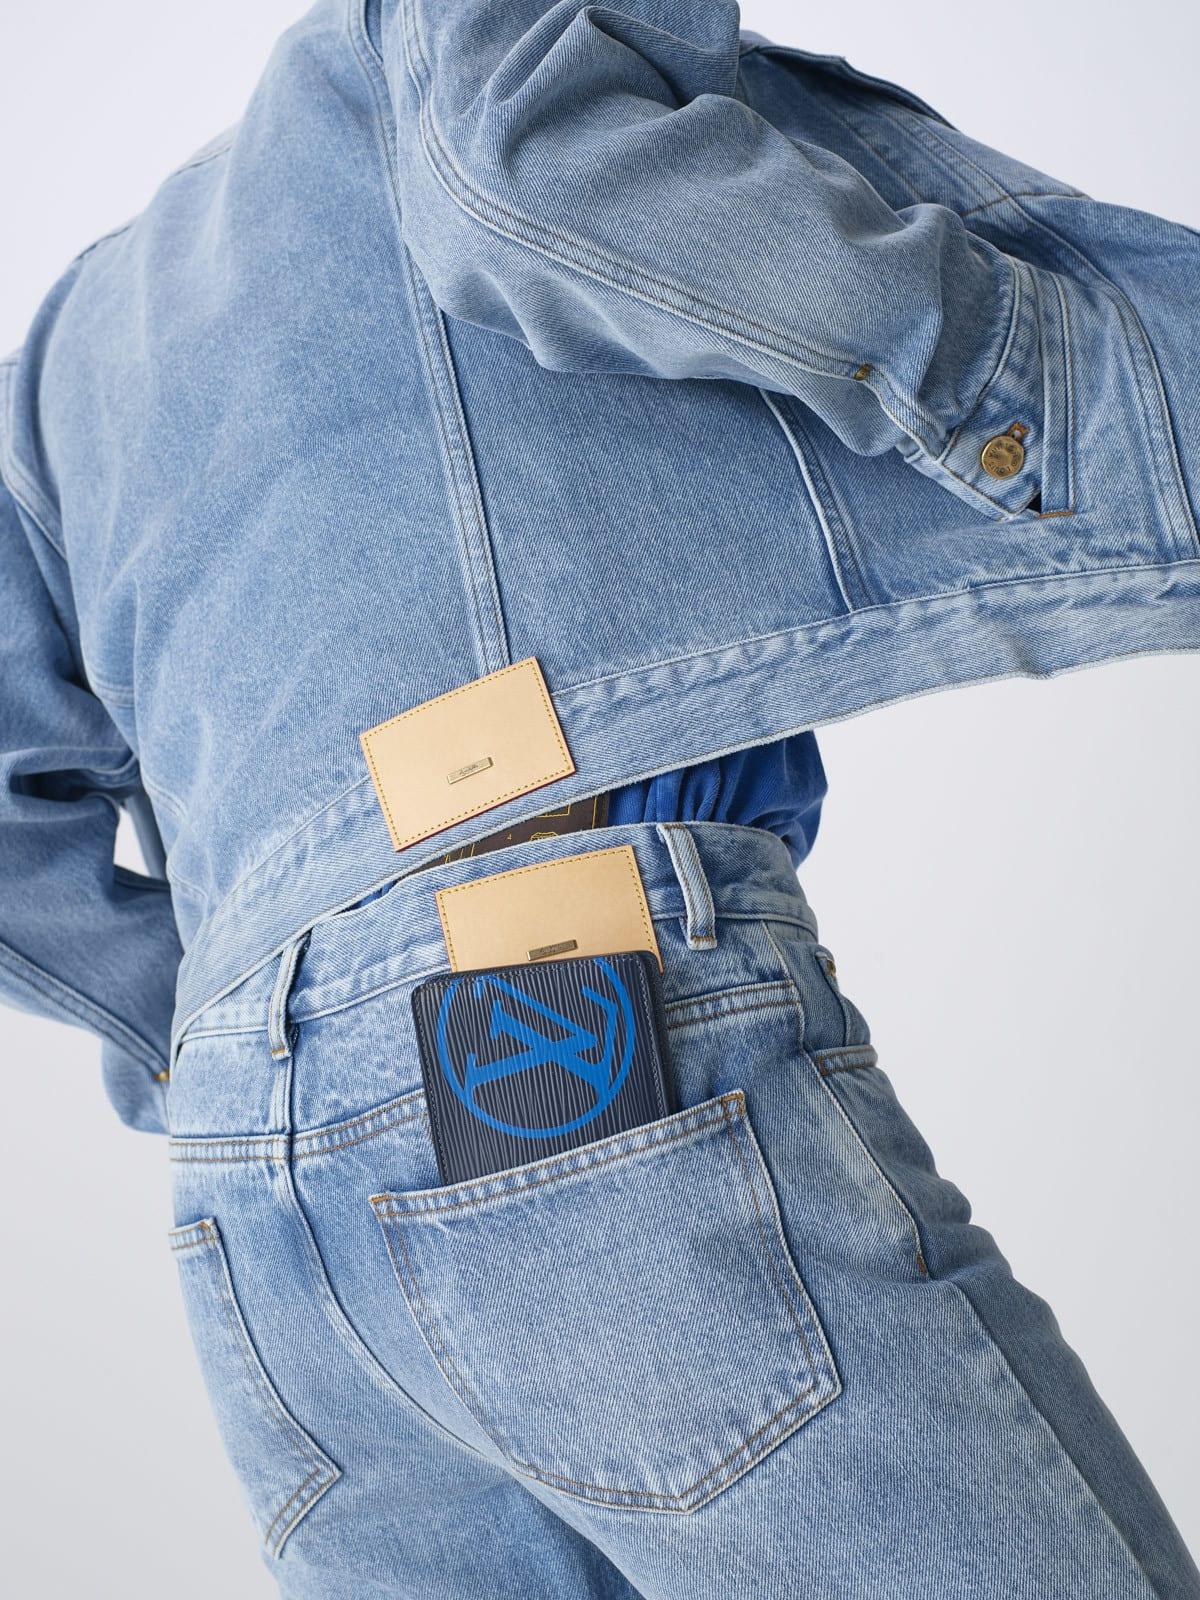 559b1cbee7cebb ルイ・ヴィトン」エピレザーを使った新作メンズバッグ発売、ポップな ...